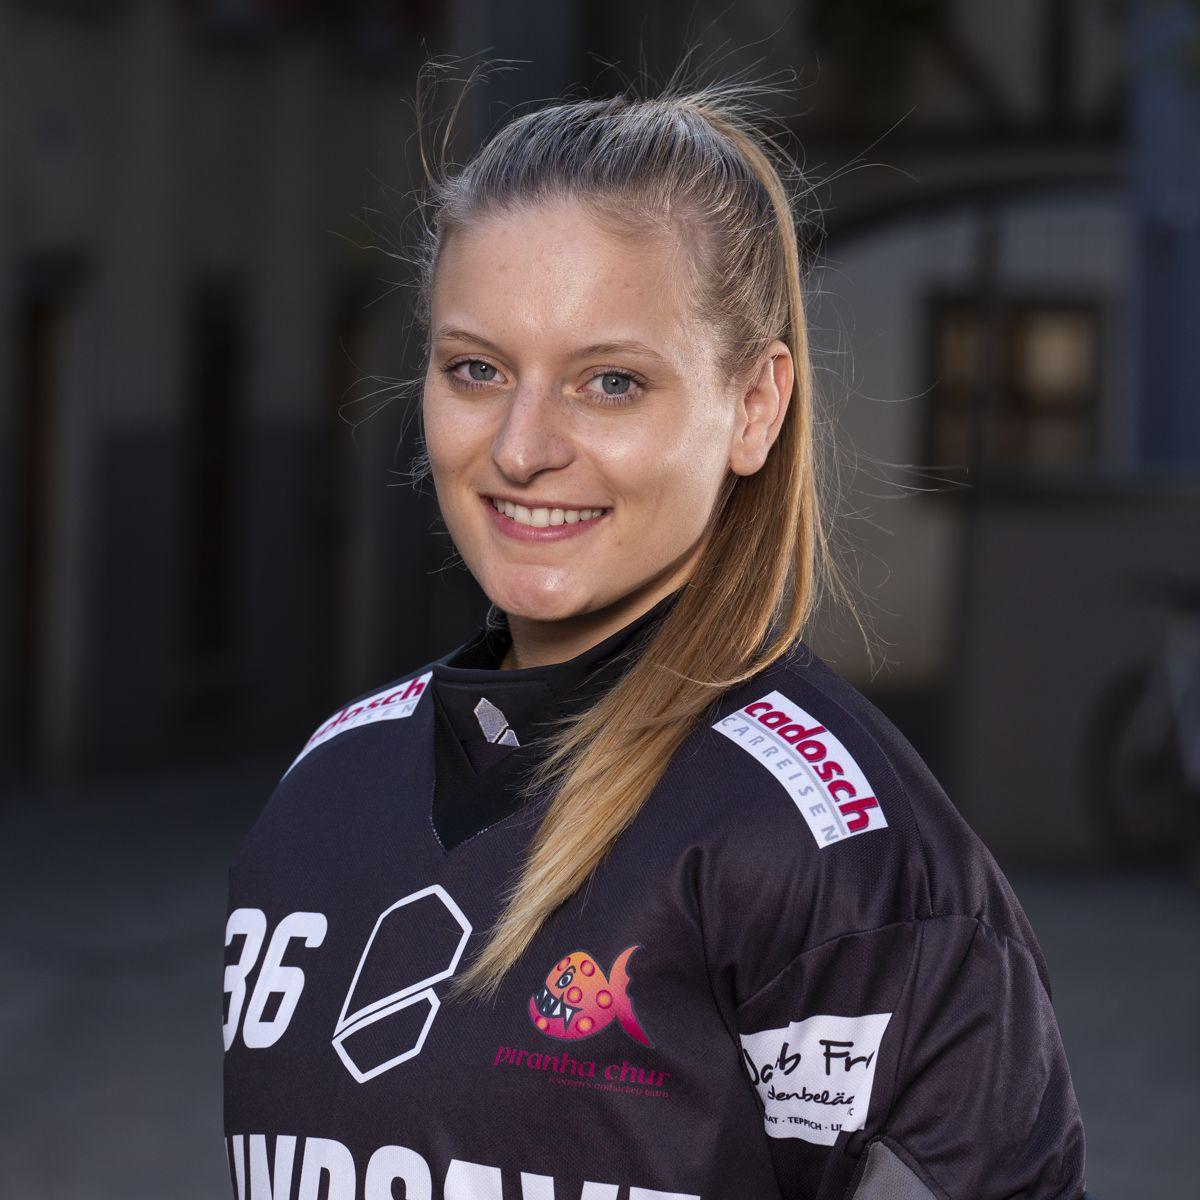 Corinne Waldburger #36_NLA_piranha Chur_Saison 2019-2020_1200x1200_01.jpg